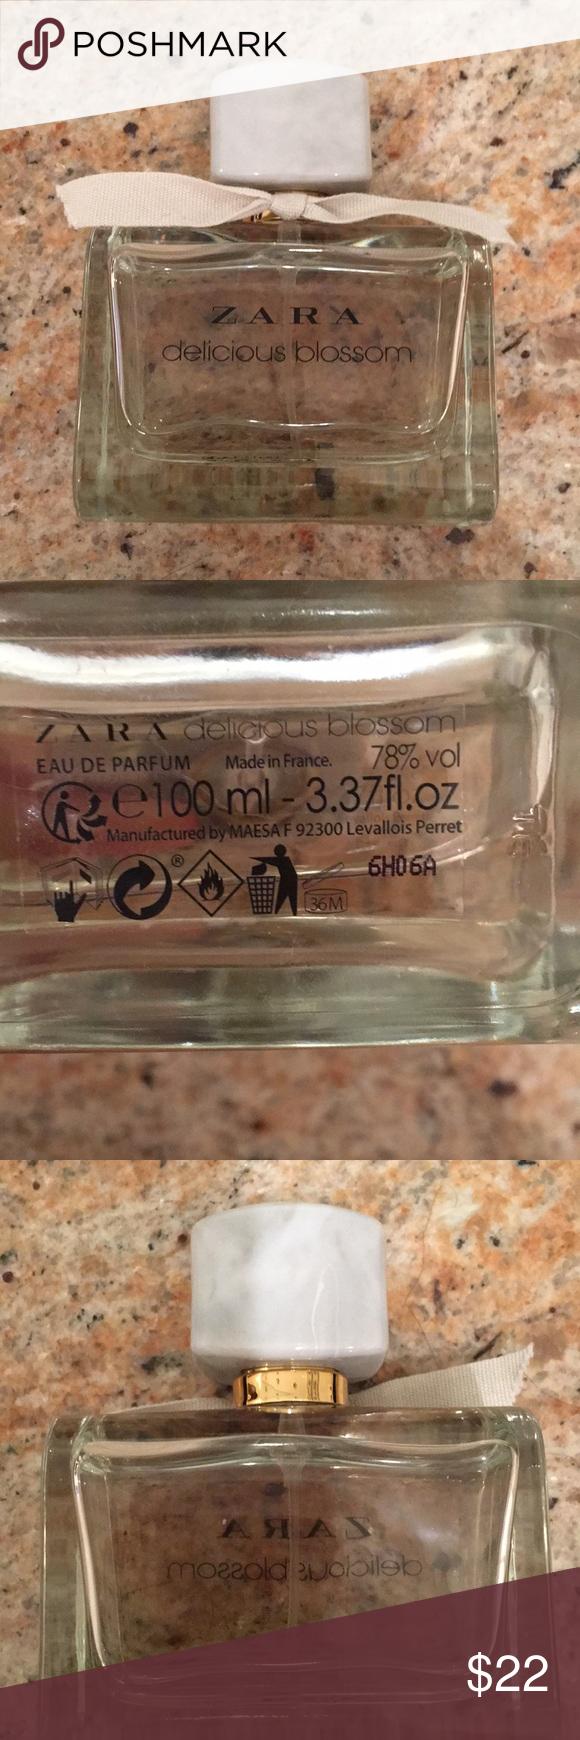 Zara Delicious Blossom Perfume 337 Fl Oz Used A Few Times Zara